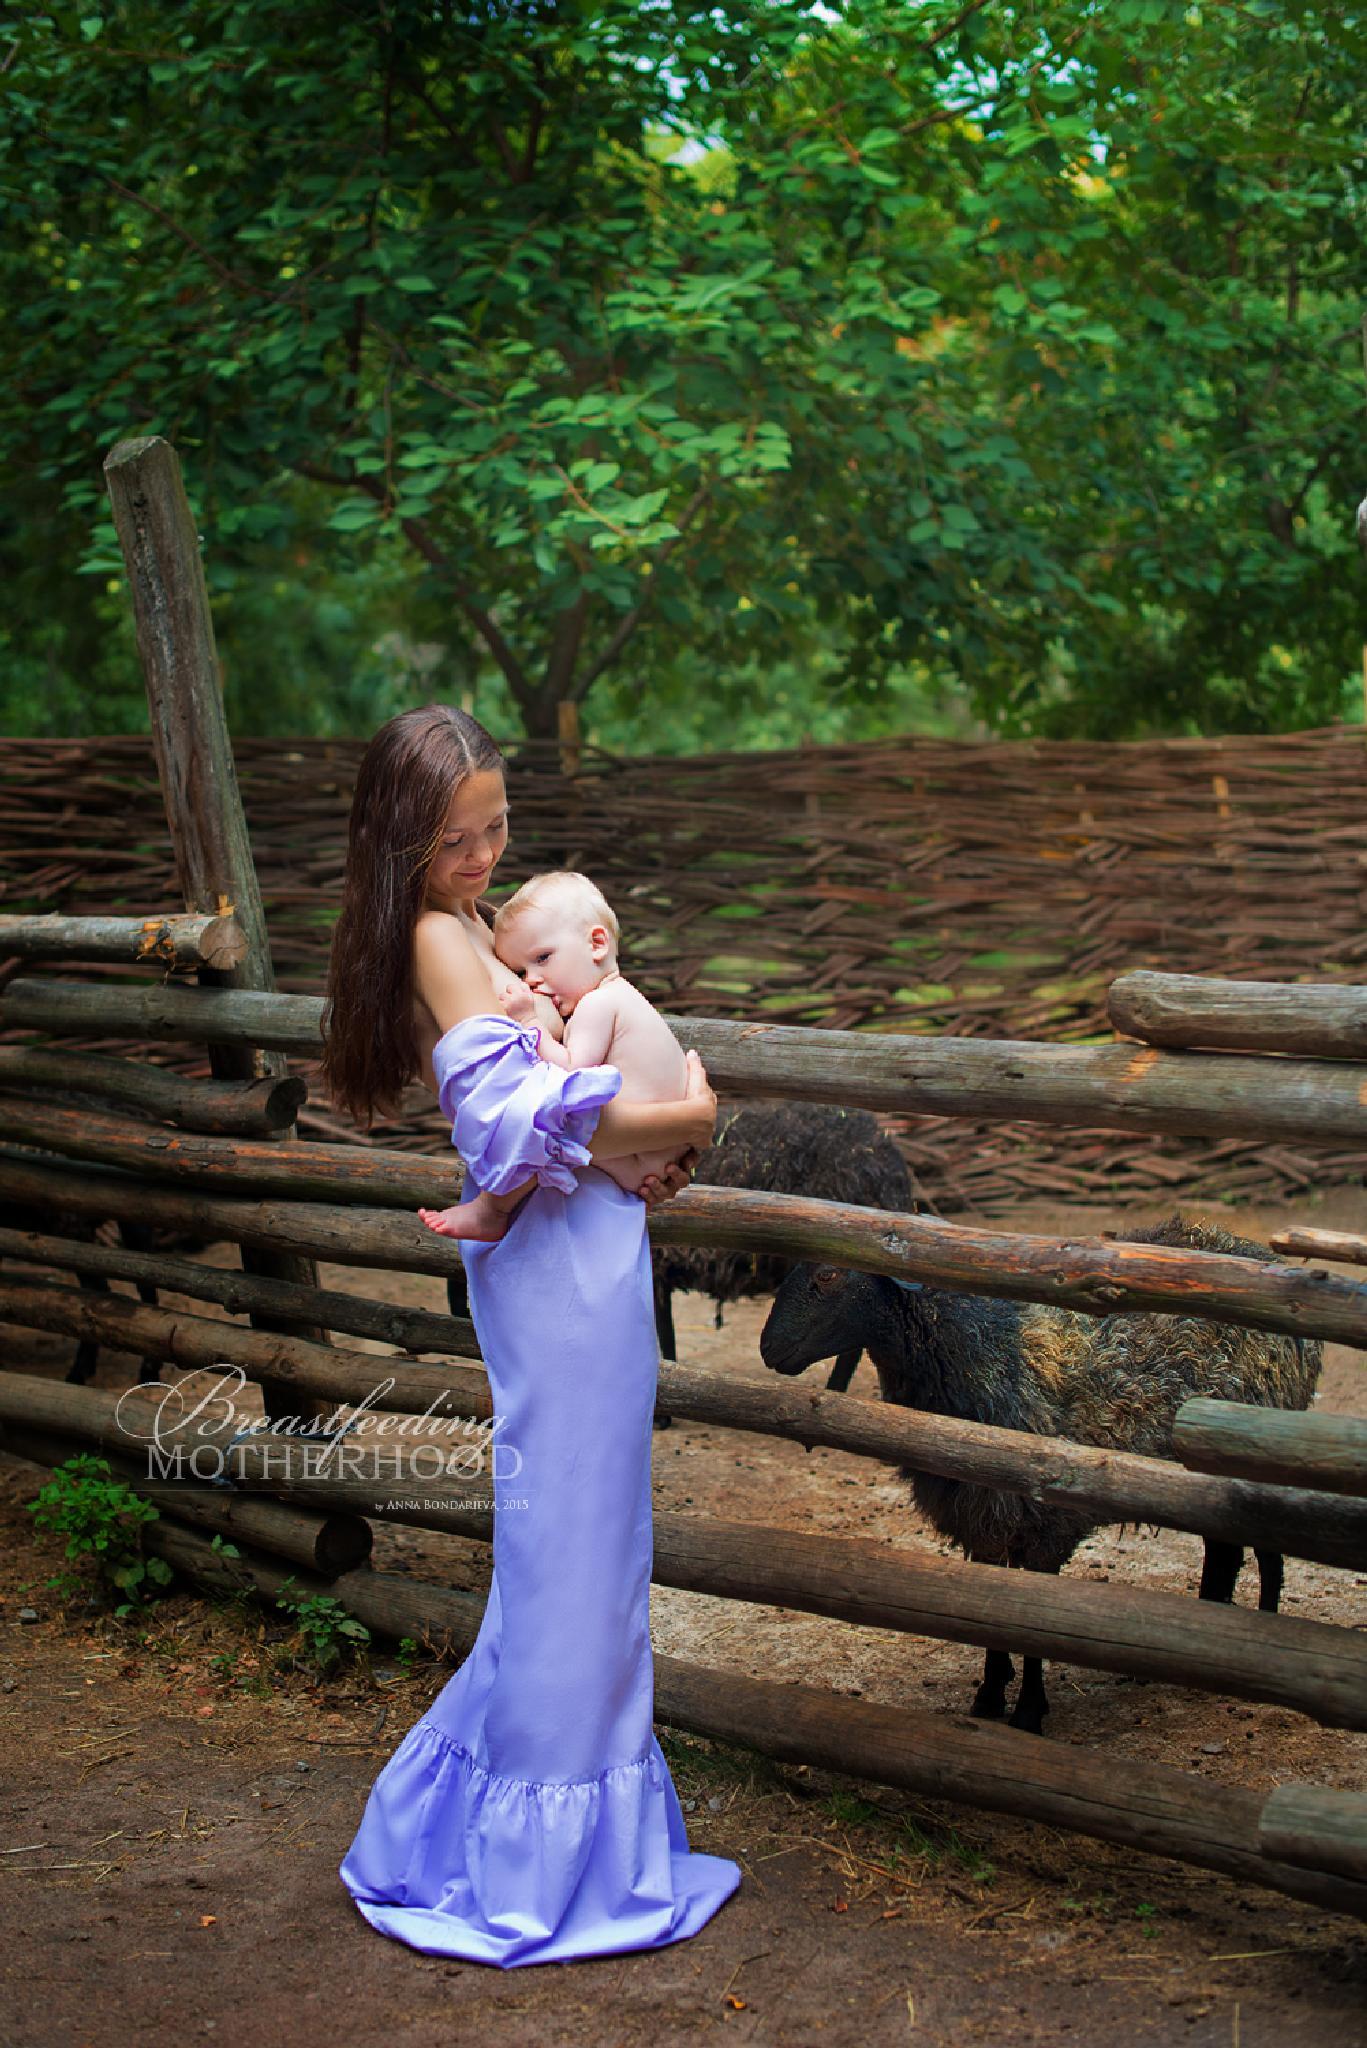 Breastfeeding MOTHERHOOD by Anna Bondareva